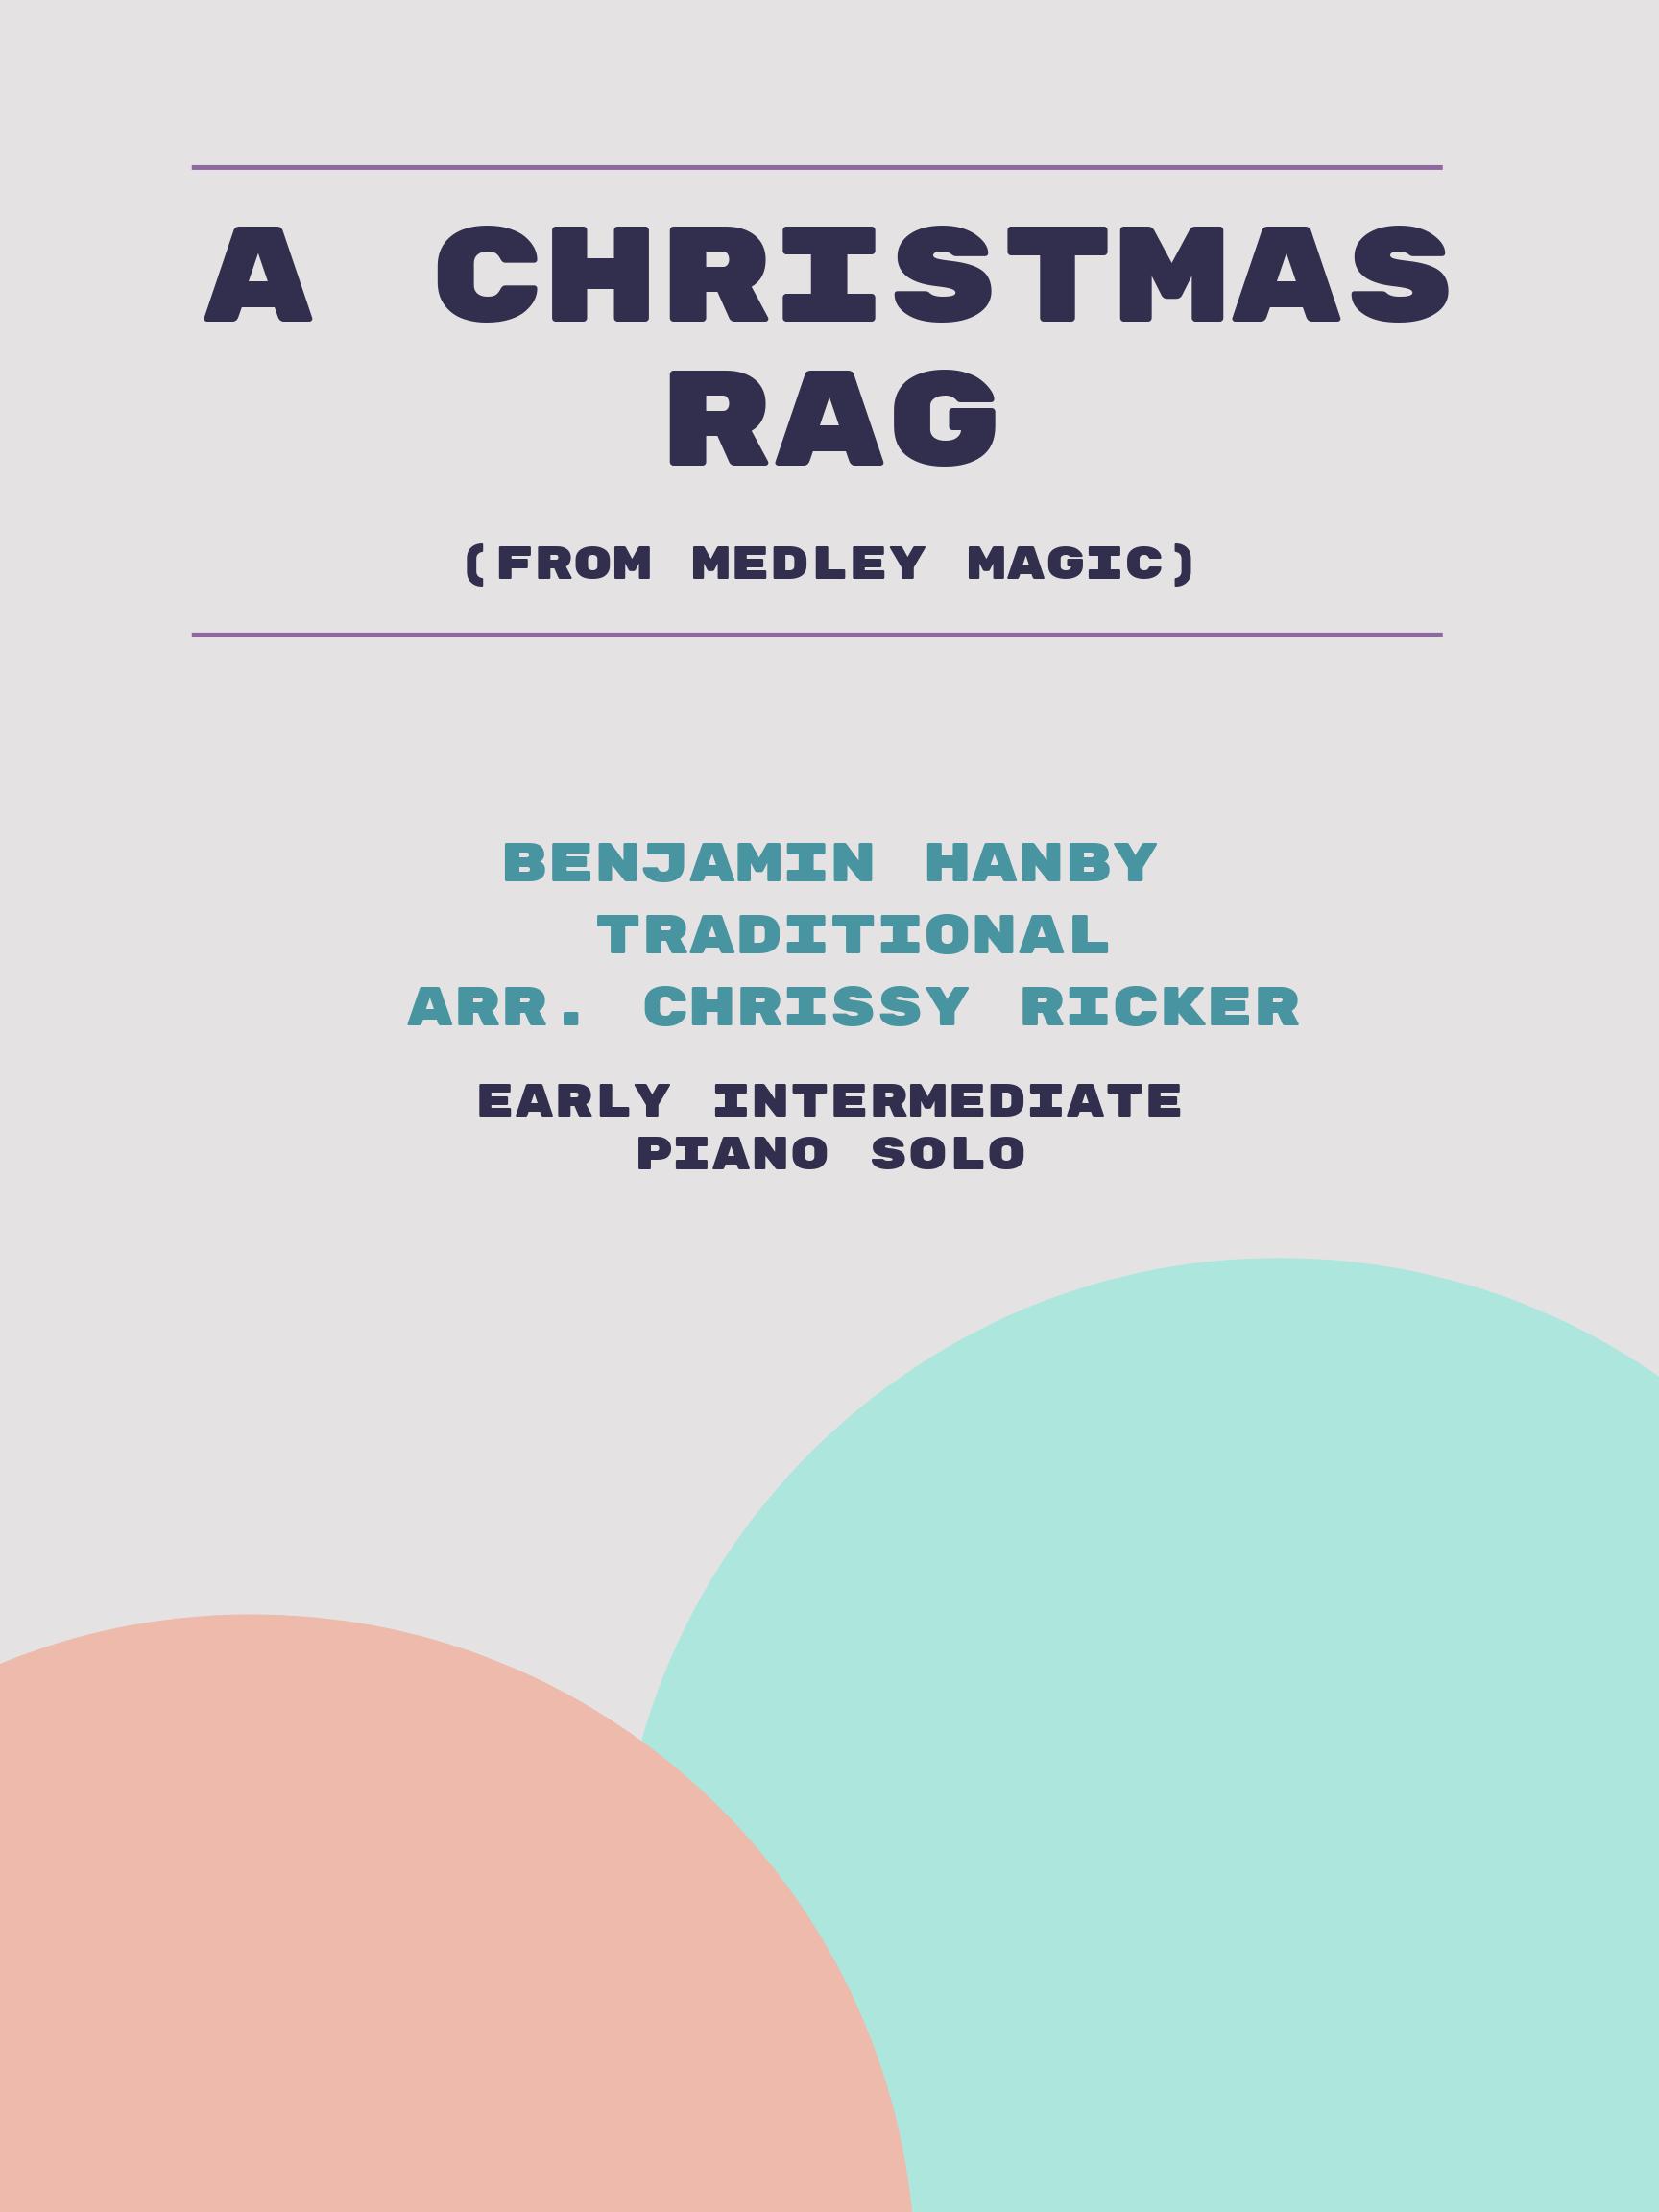 A Christmas Rag by Benjamin Hanby, Traditional